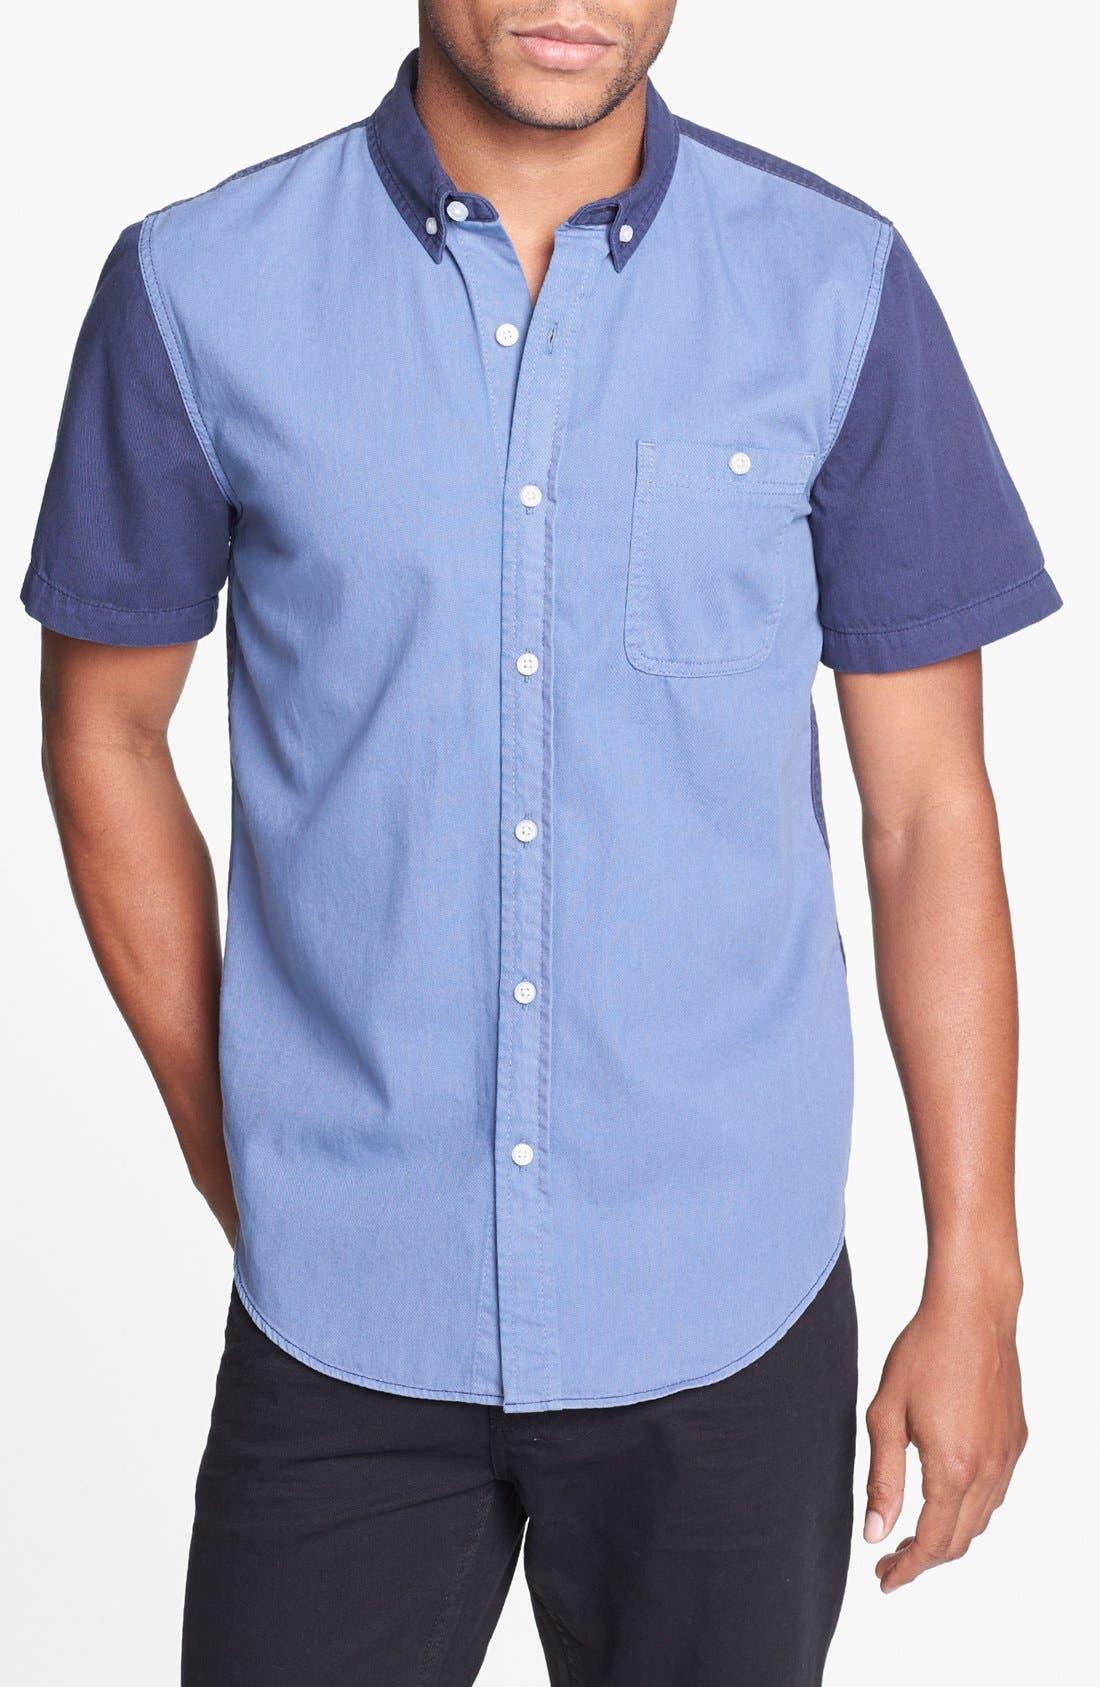 Alternate Image 1 Selected - Topman Tonal Panel Shirt